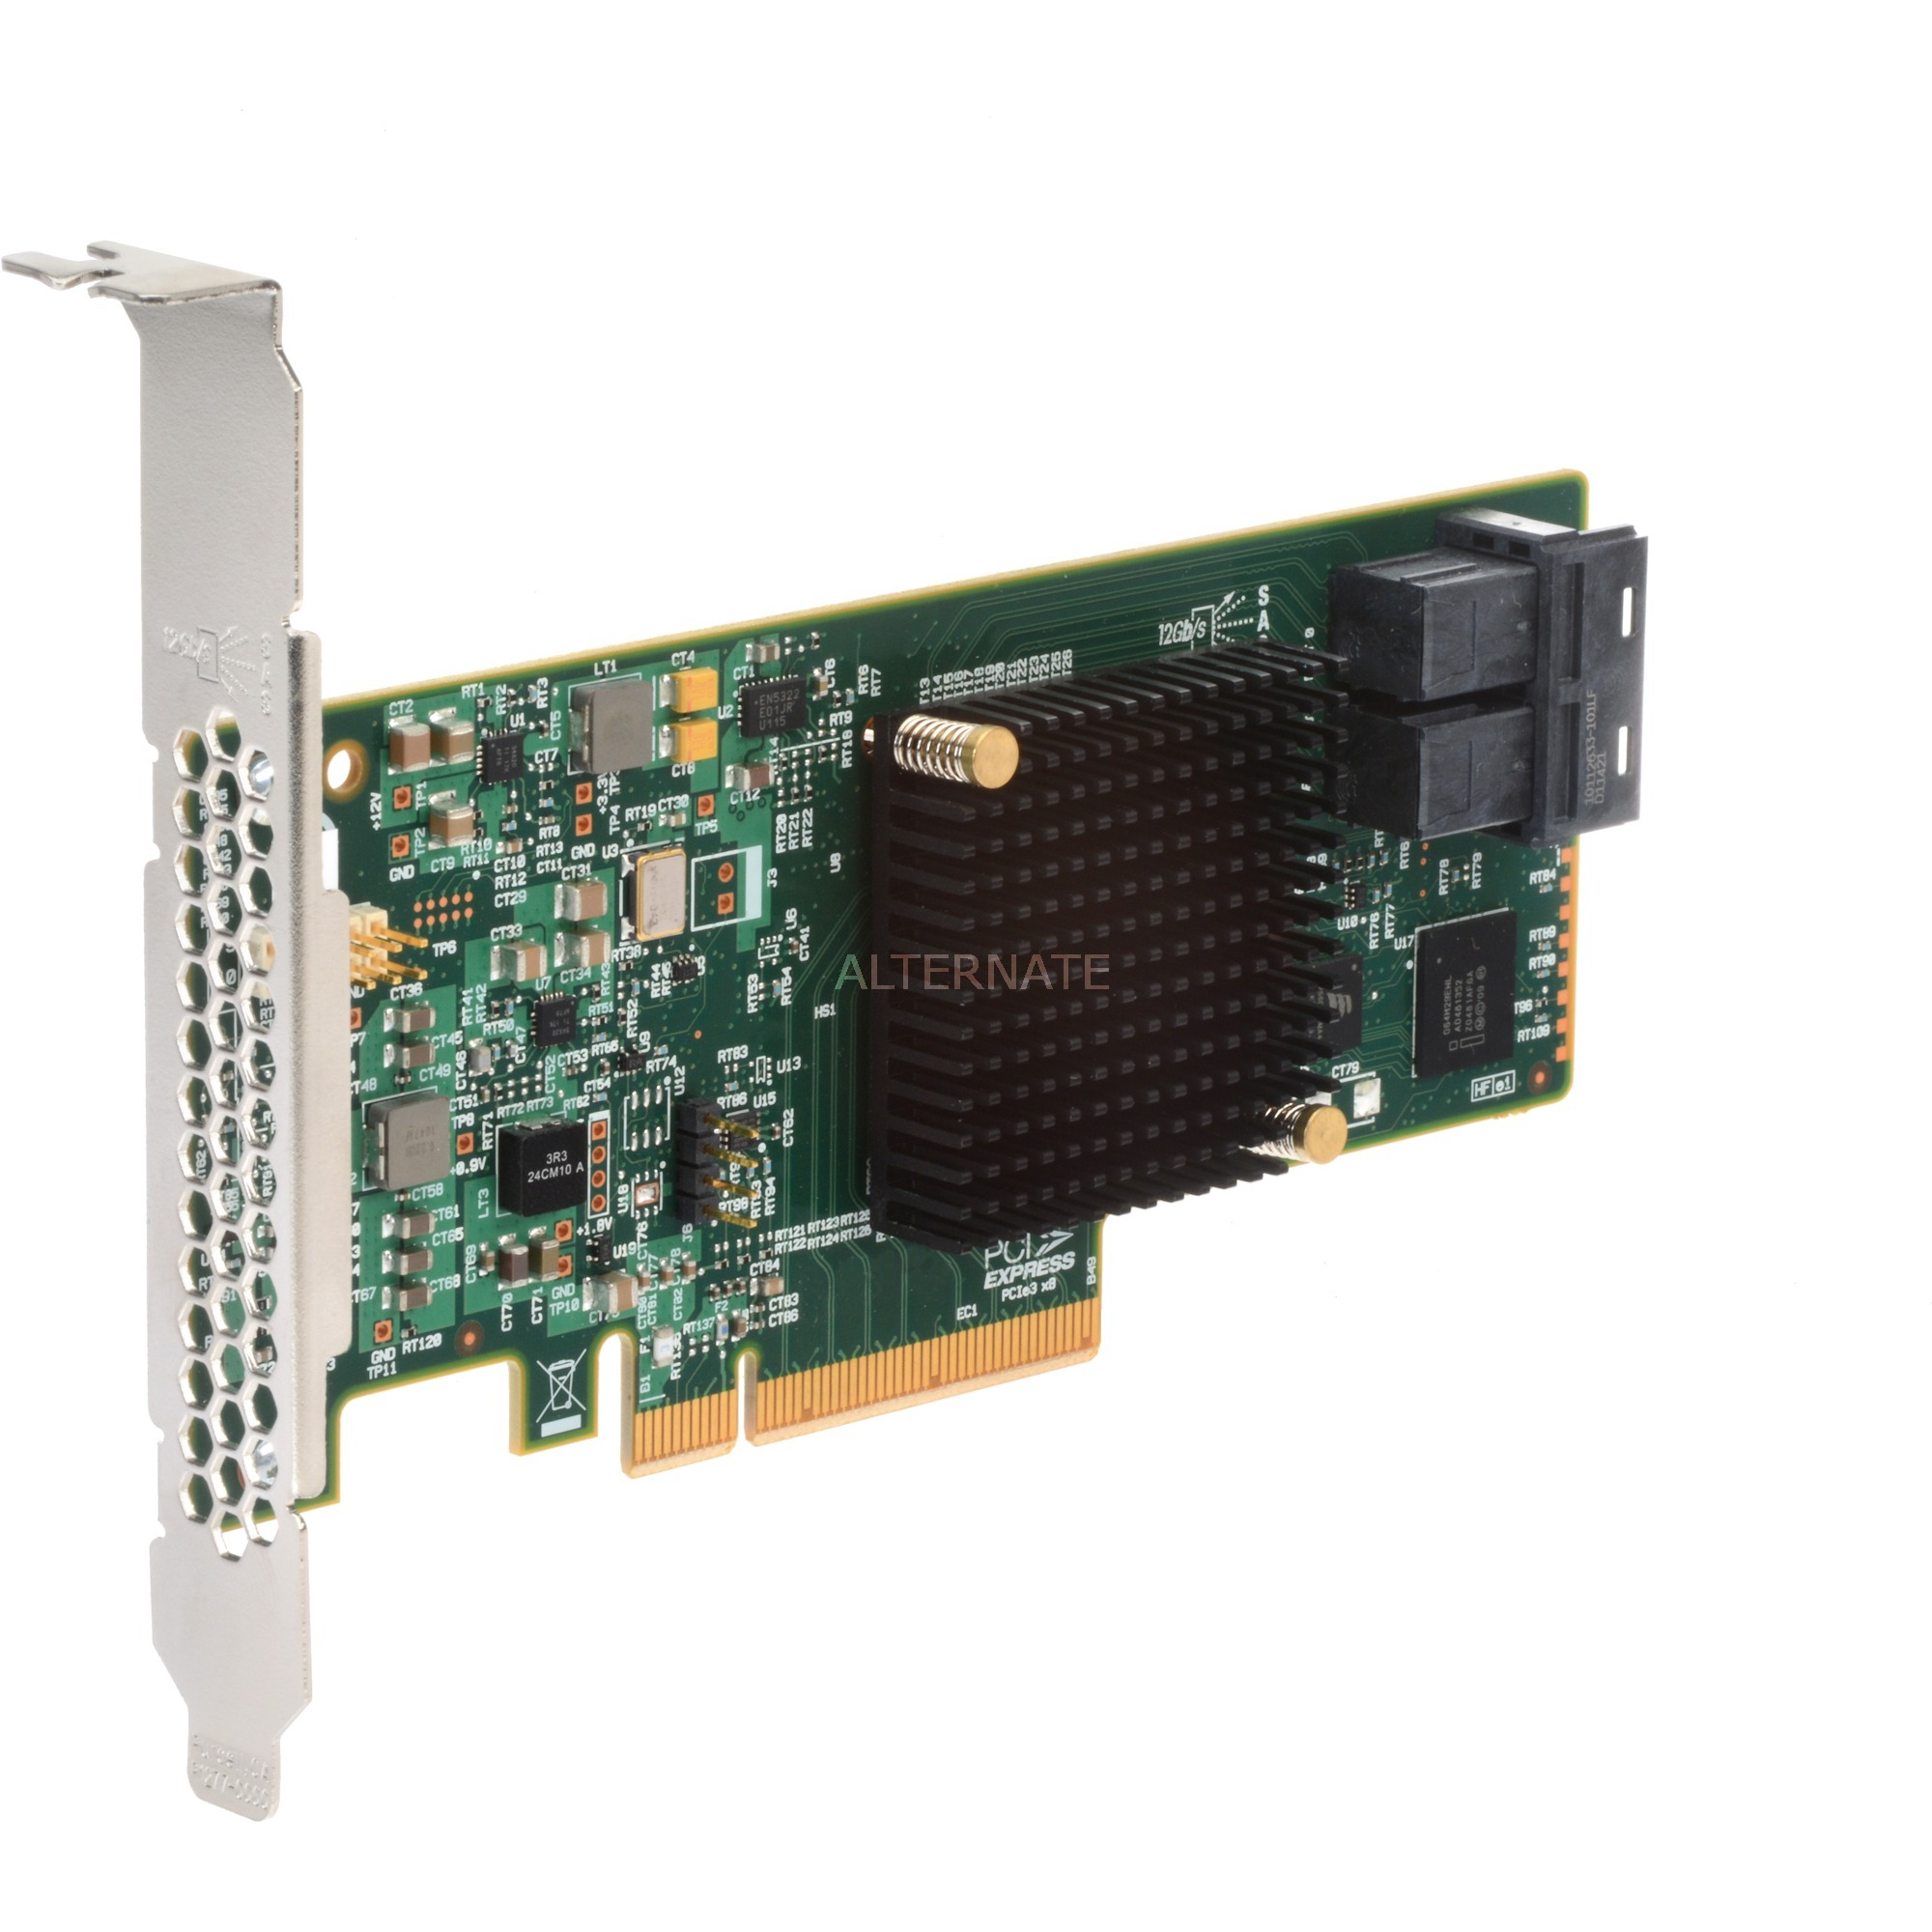 MegaRAID SAS 9341-8i PCI Express x8 3.0 12Gbit/s controlado RAID, Controlador